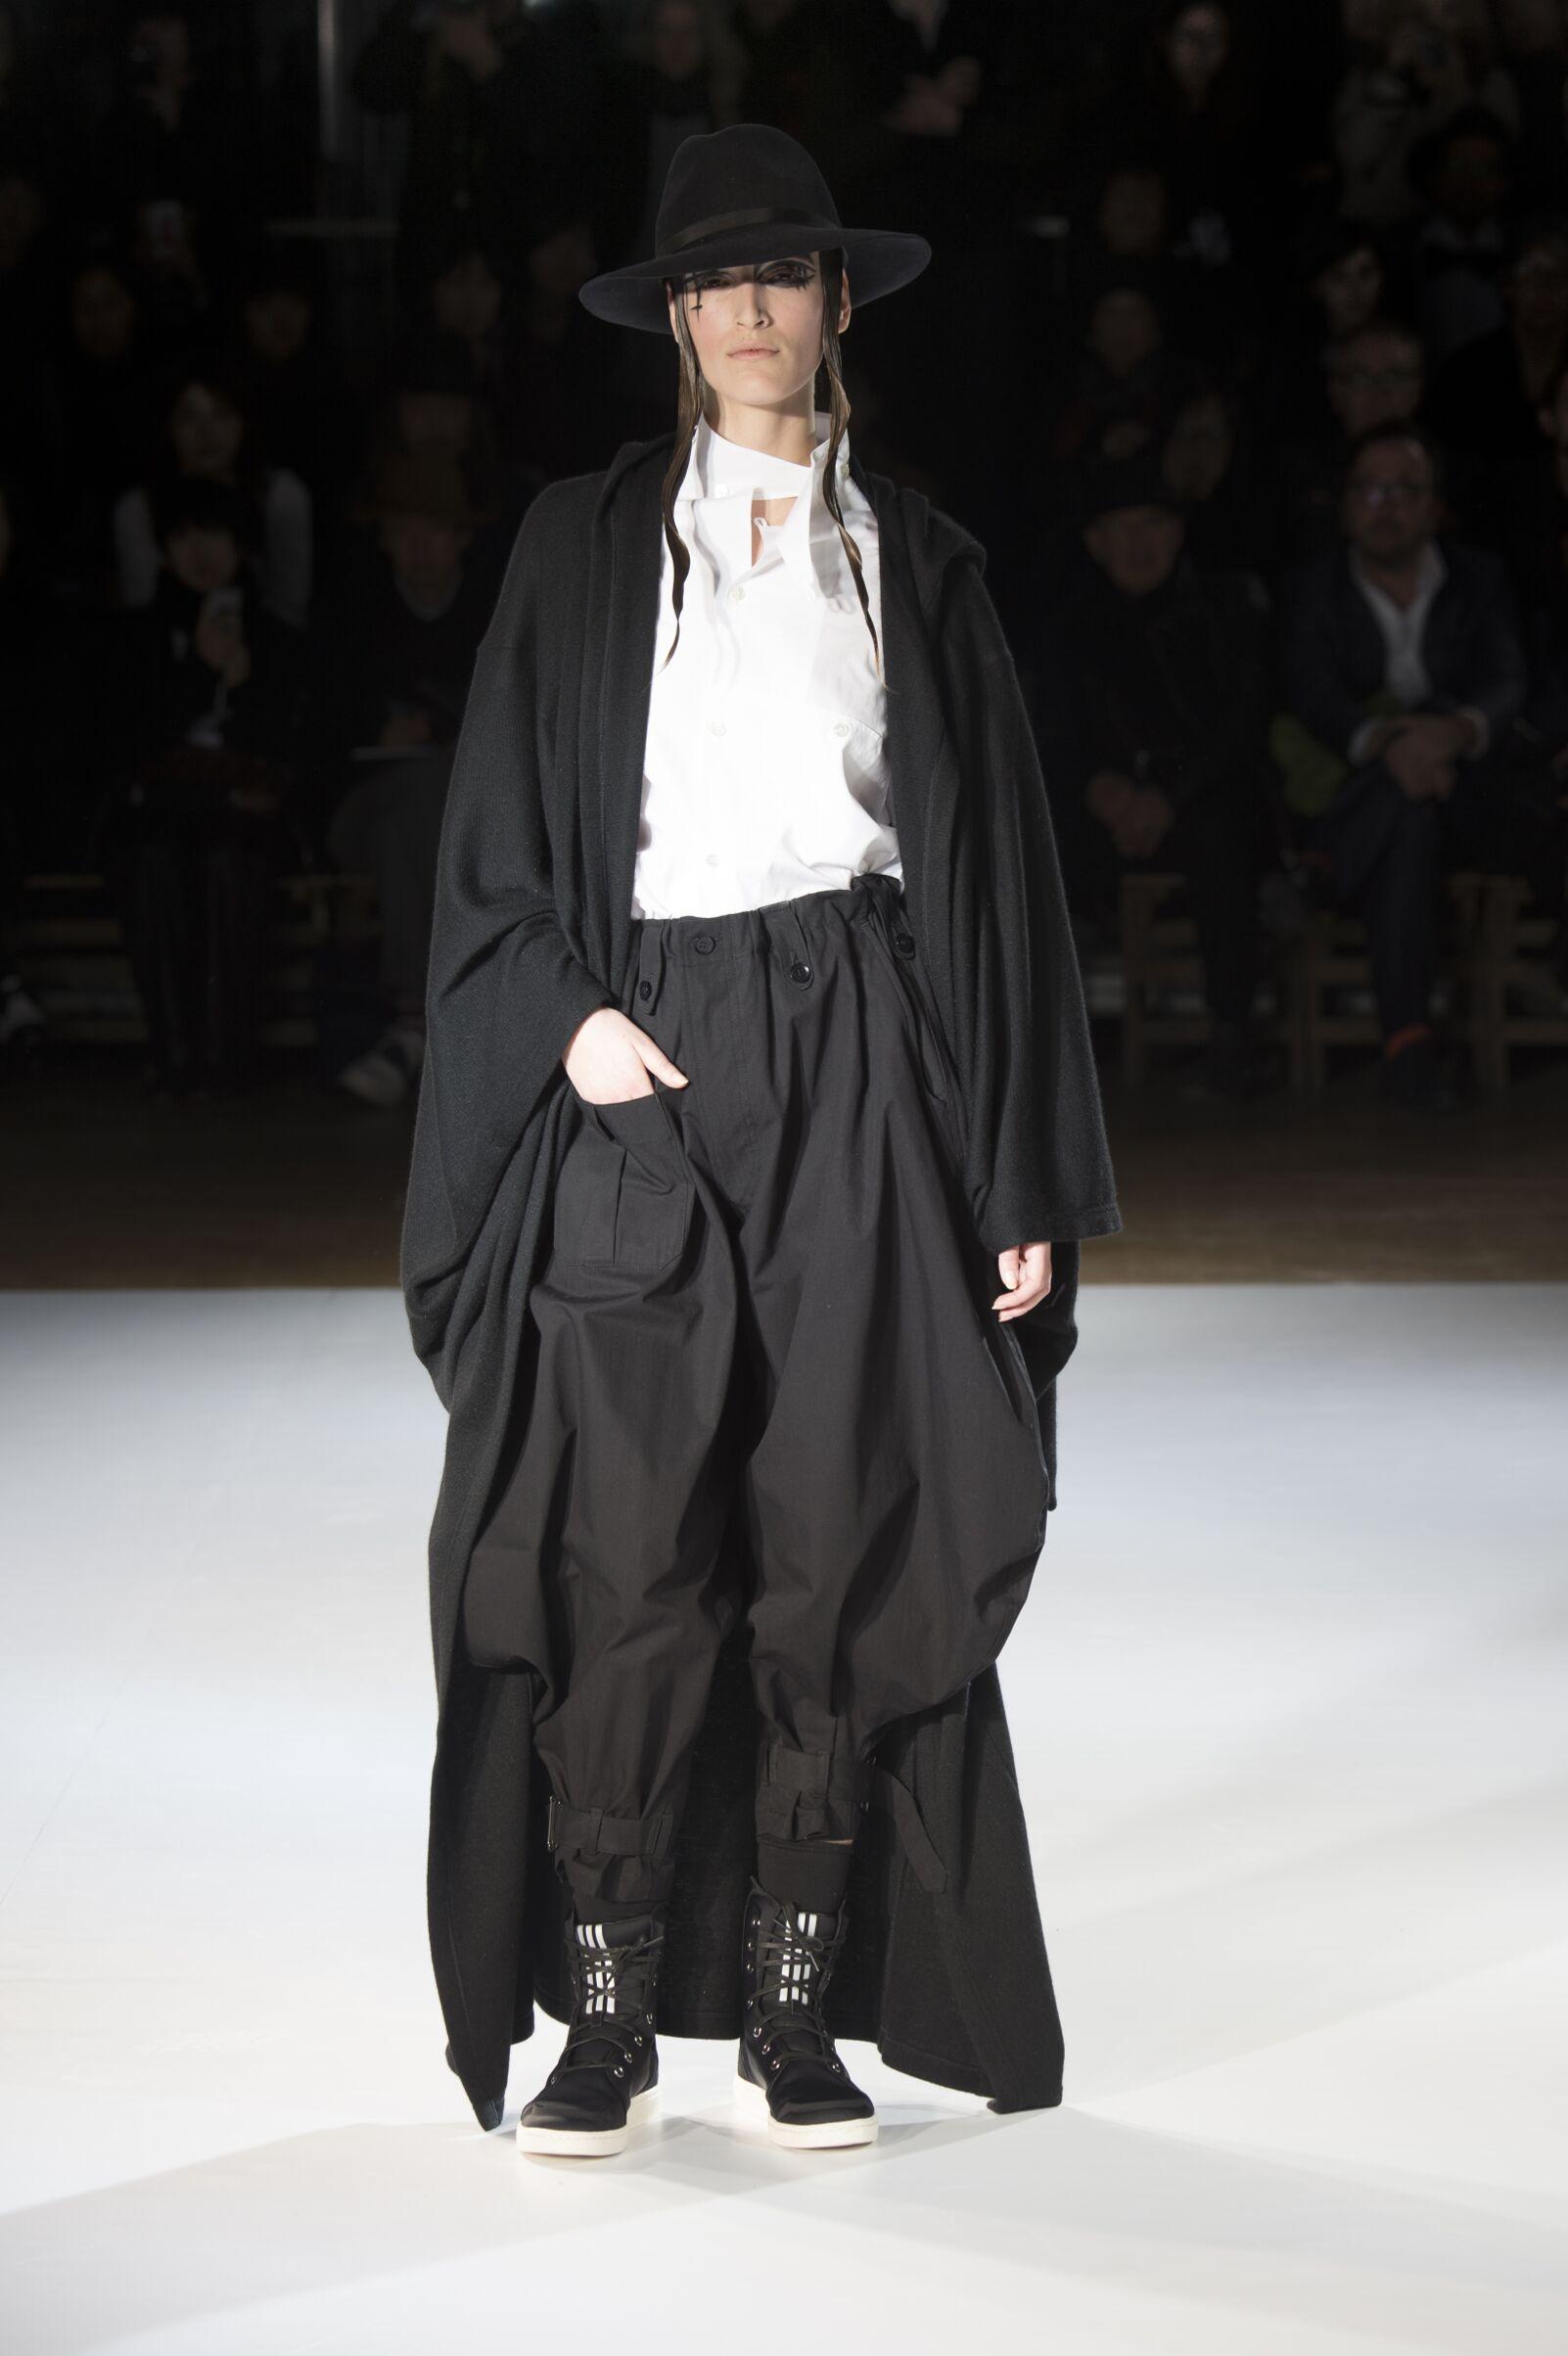 Winter 2015 Fashion Trends Yohji Yamamoto Collection